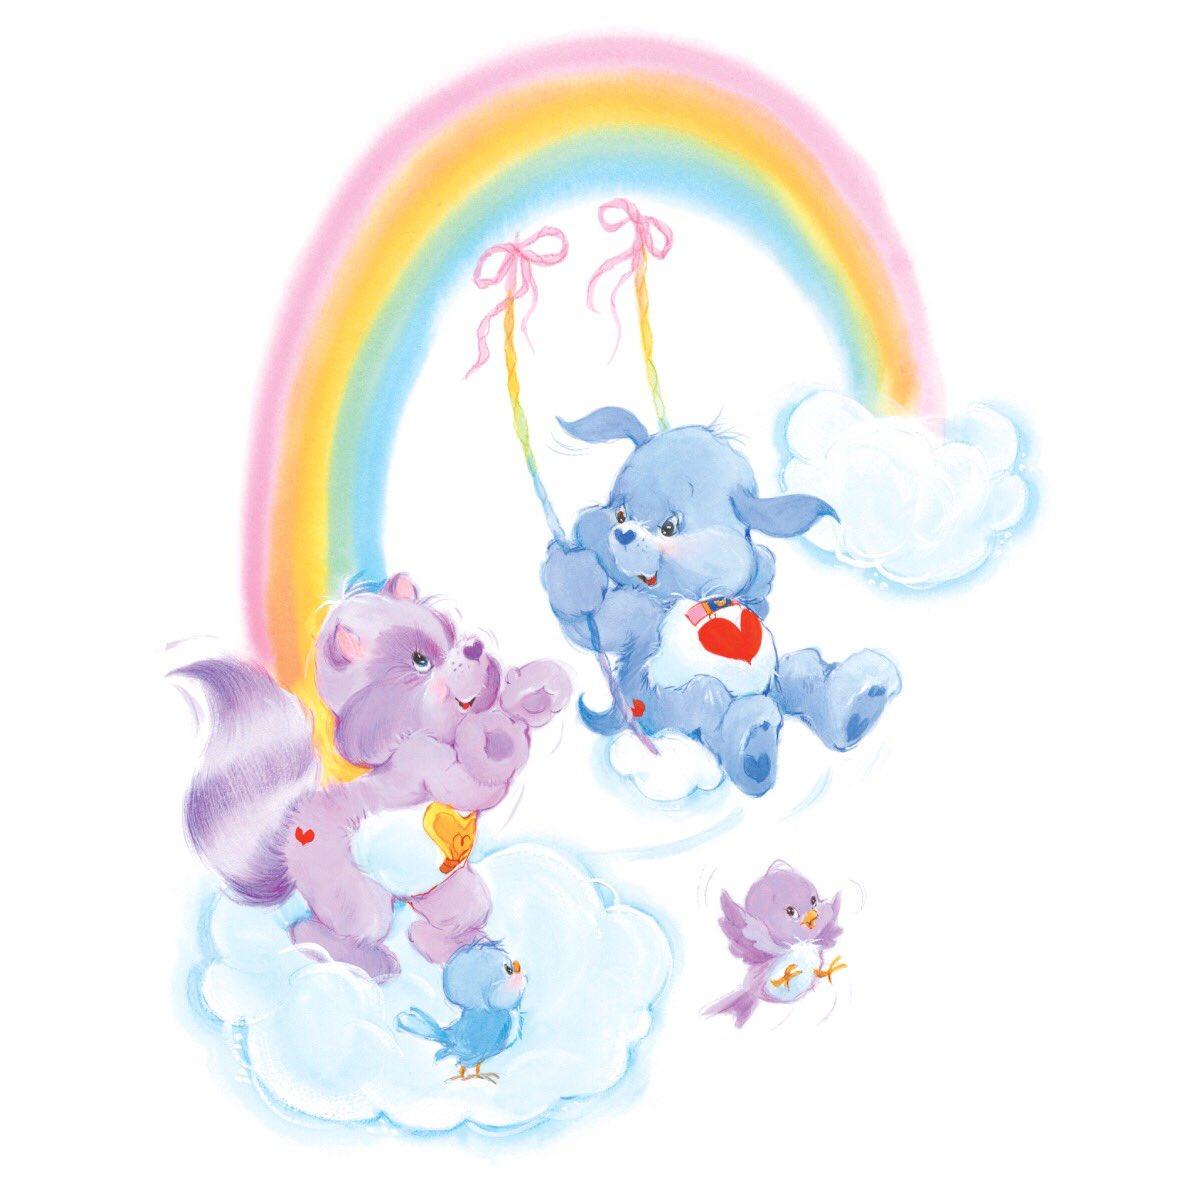 Have a rainbow day! #TBT <br>http://pic.twitter.com/1BViUnPFDp